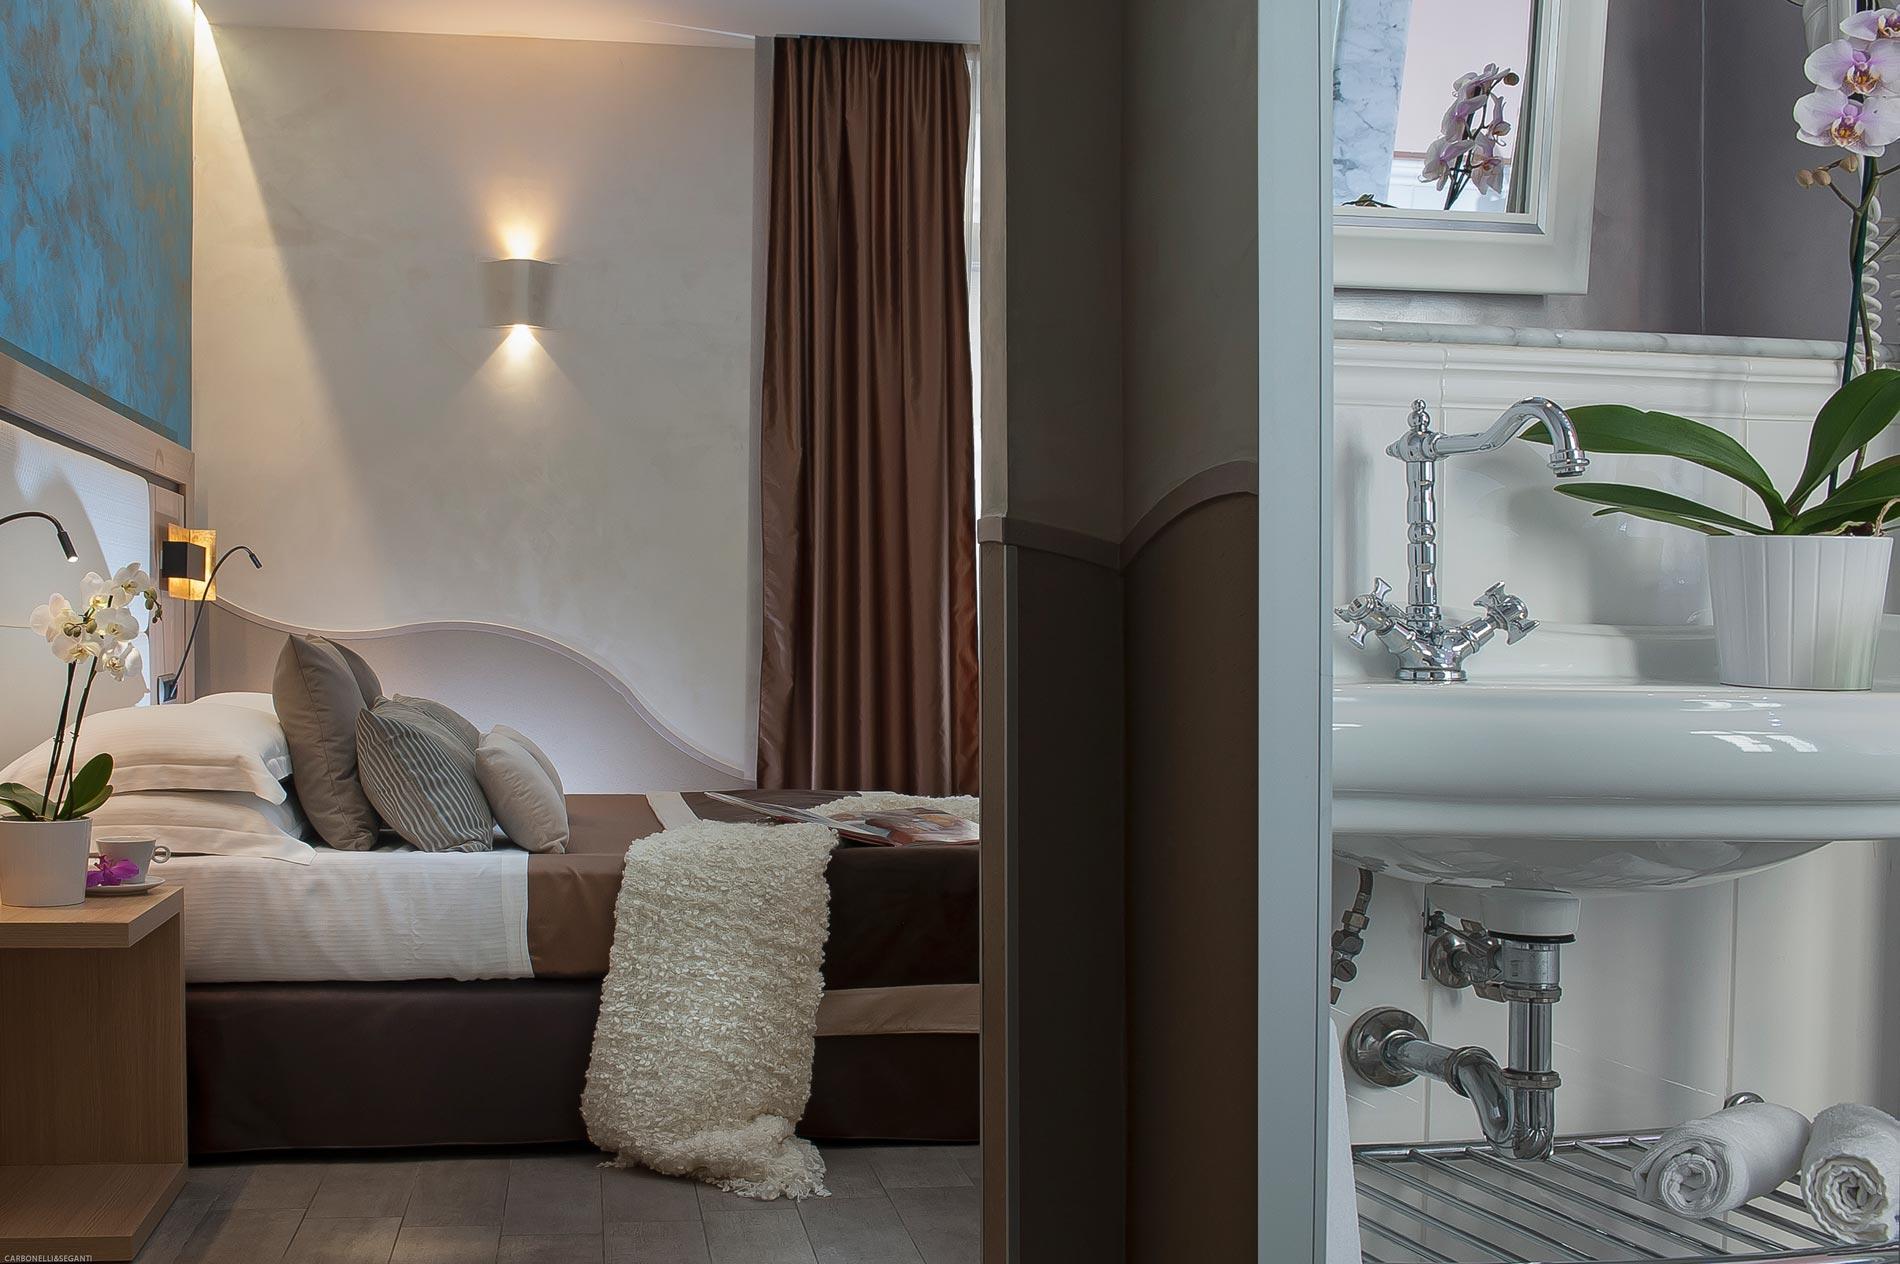 chambre lit double h´tel rome chambre lit double rome h´tel